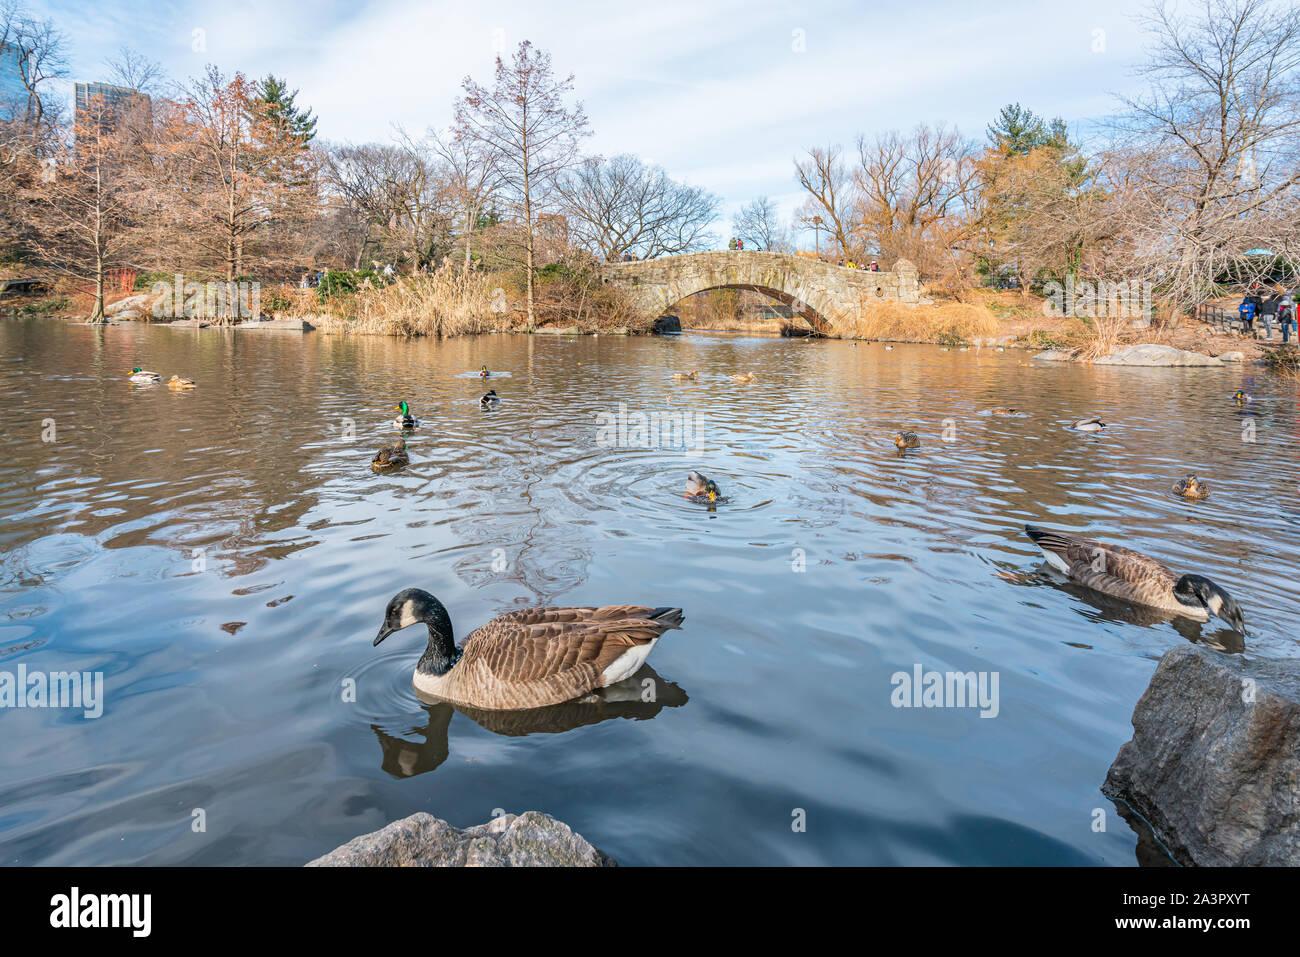 New York City, NY, USA - 25th, December, 2018 - Beautiful cold sunny day in Central Park lake with ducks near Gapstow Bridge, Manhattan. Stock Photo